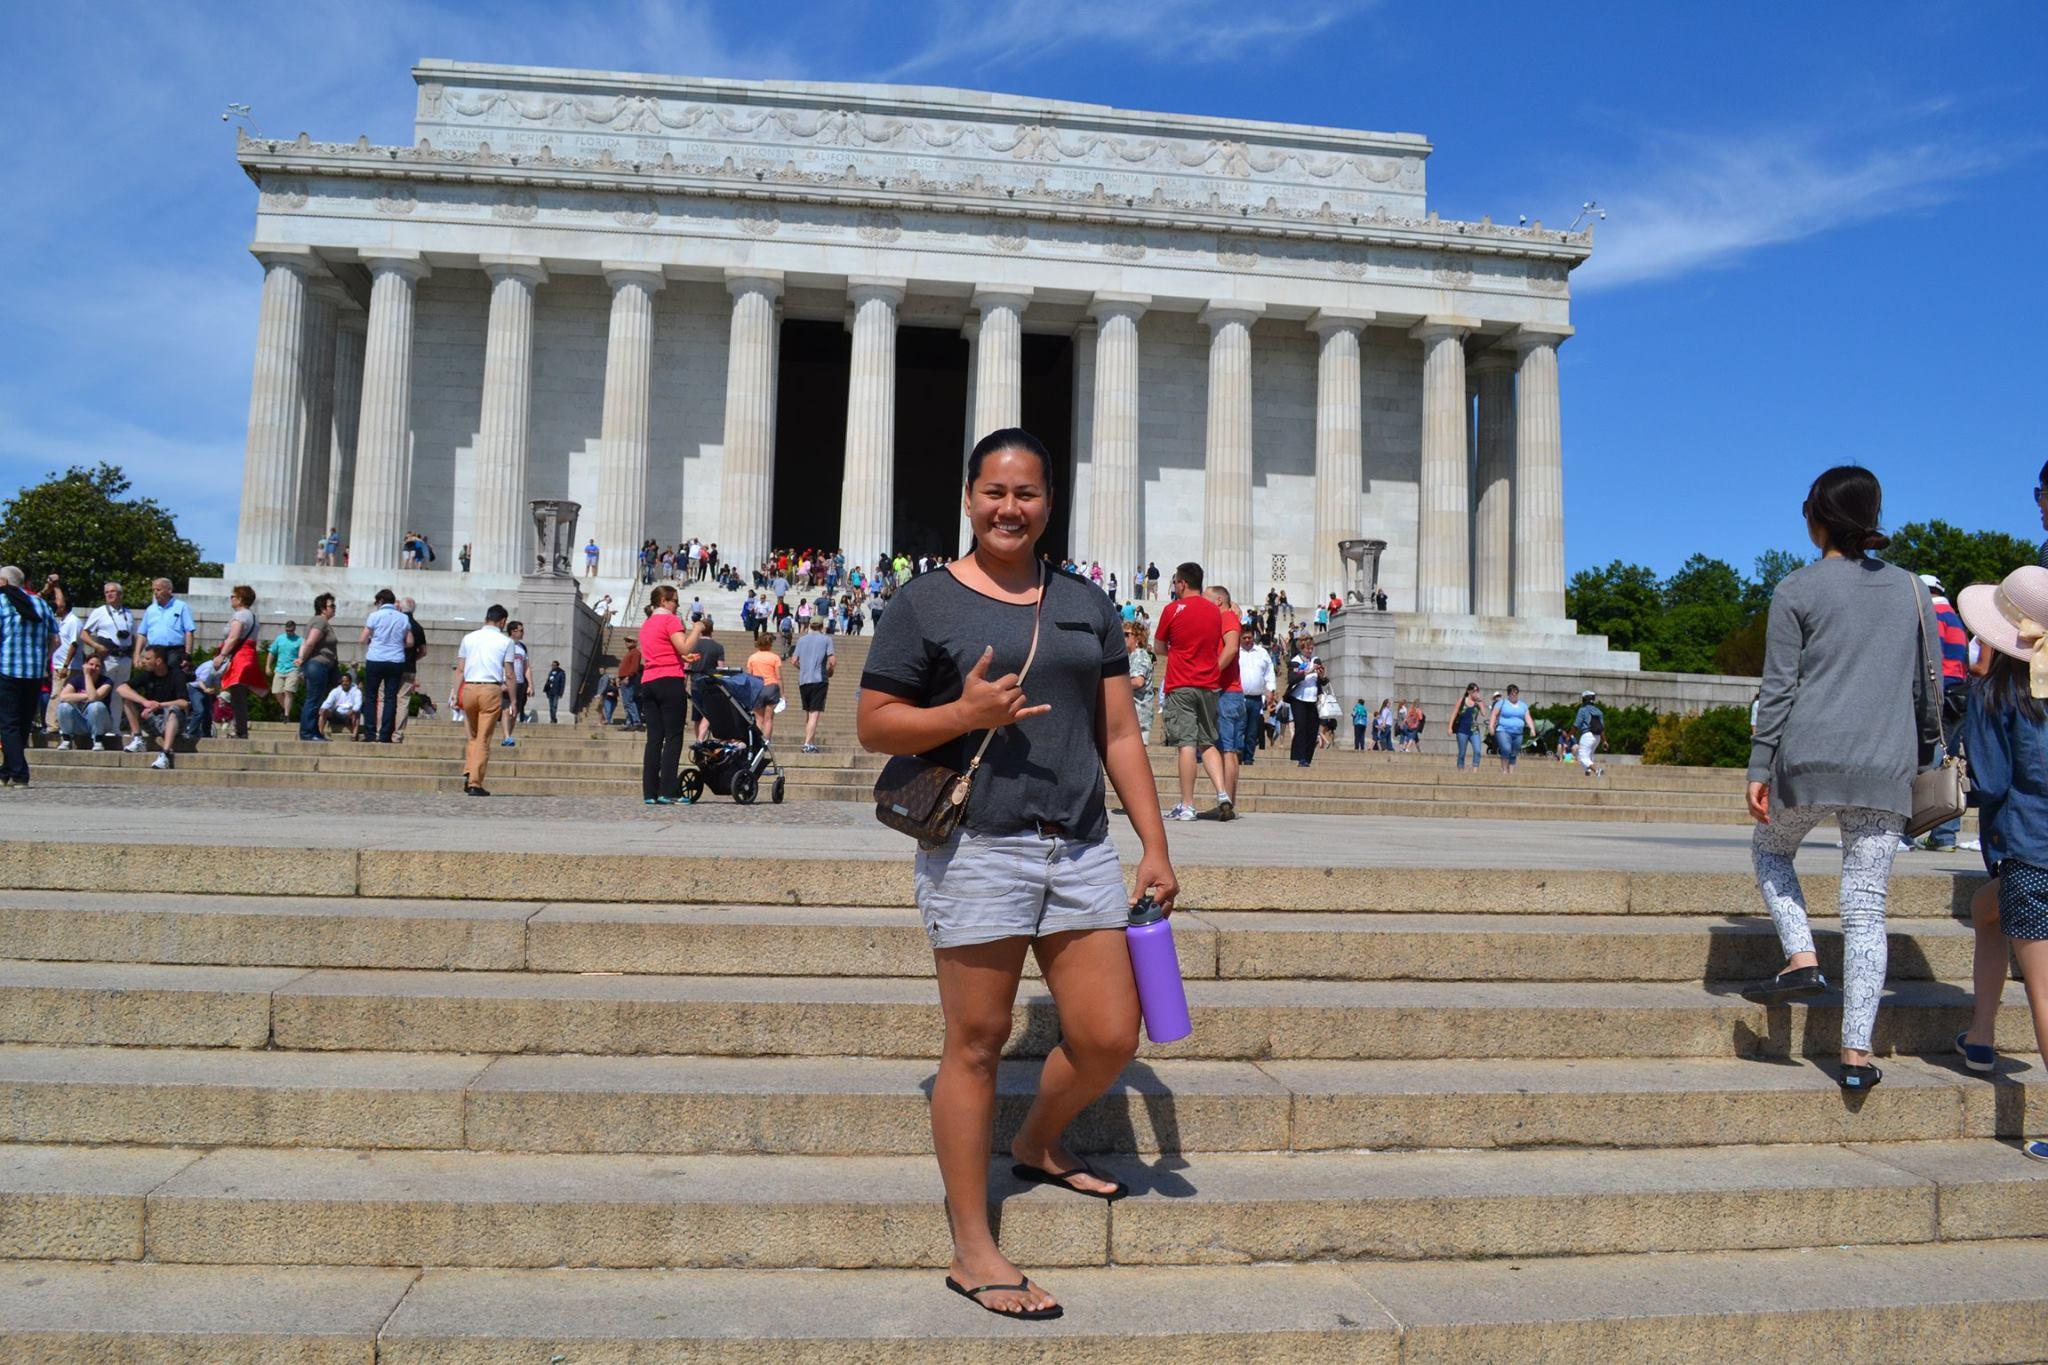 Pelenatete Leilua standing in front of the Lincoln Memorial, Washington, D.C.